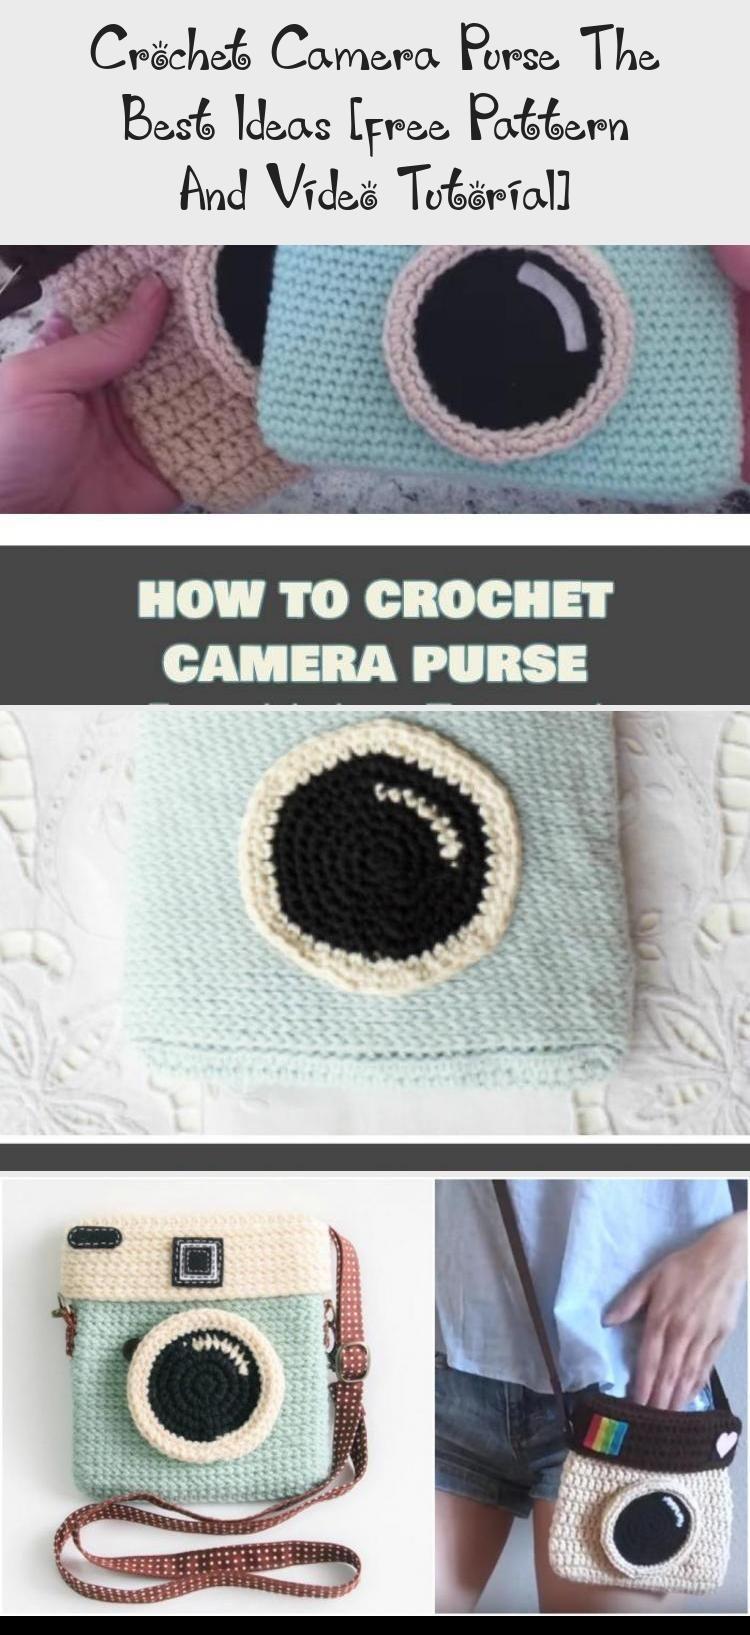 Crochet Camera Purse The Best Ideas [free Pattern And Video Tutorial] - crochetthat #camerapurse Crochet Camera Purse The Best Ideas, Free Crochet Pattern and Video Tutorial #crochetToys #crochetForBeginners #crochetHeart #crochetAfghan #crochetIdeas #crochetcamera